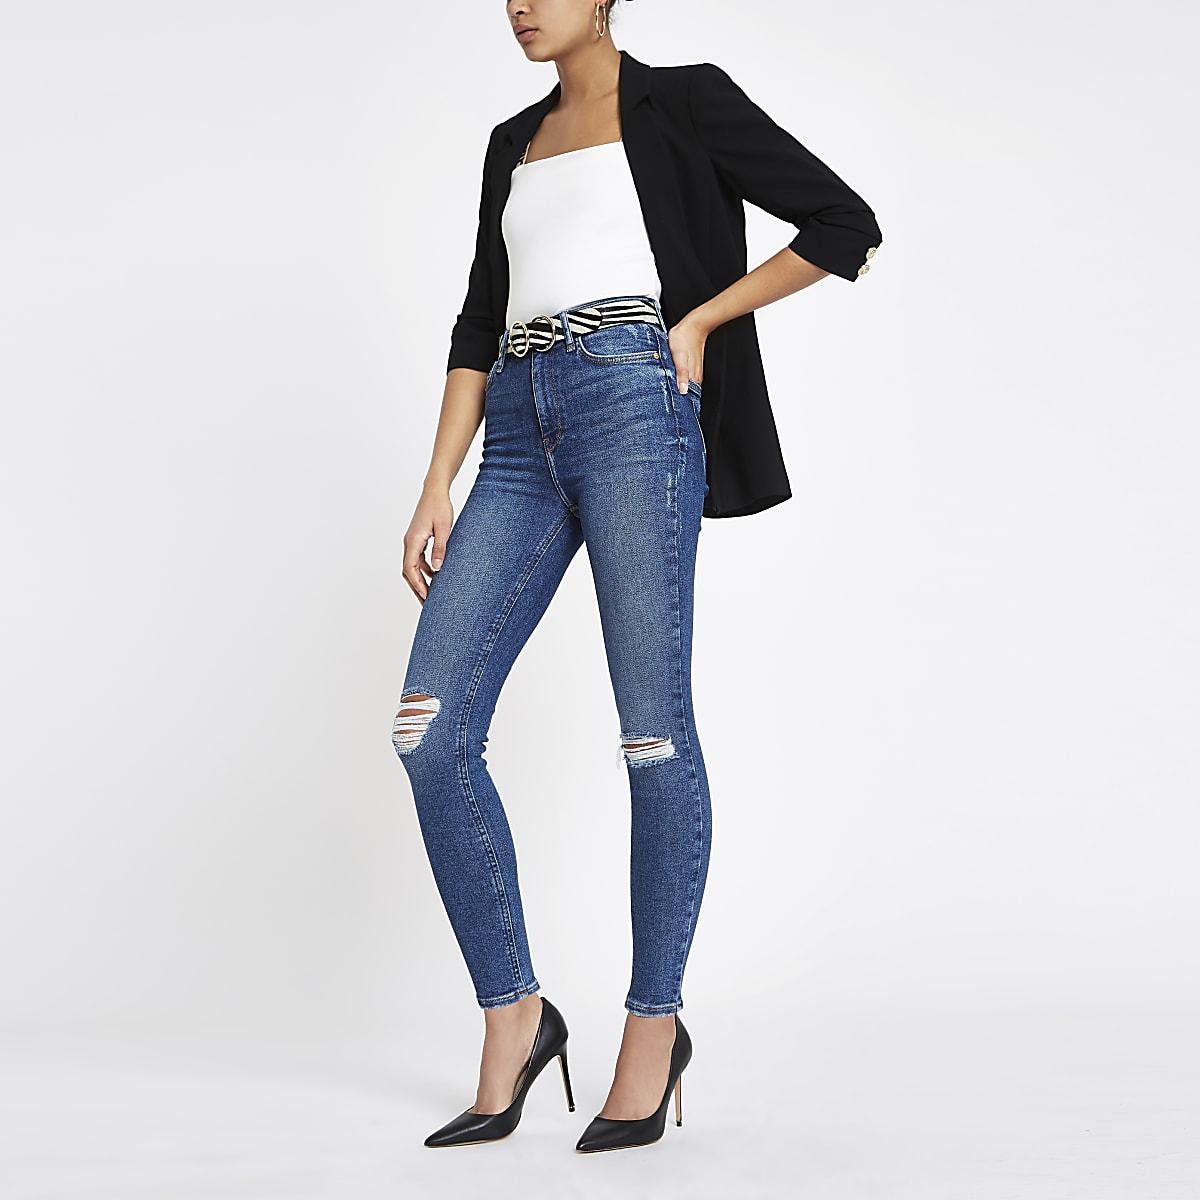 Hailey - Middenblauwe ripped denim jeans met hoge taille